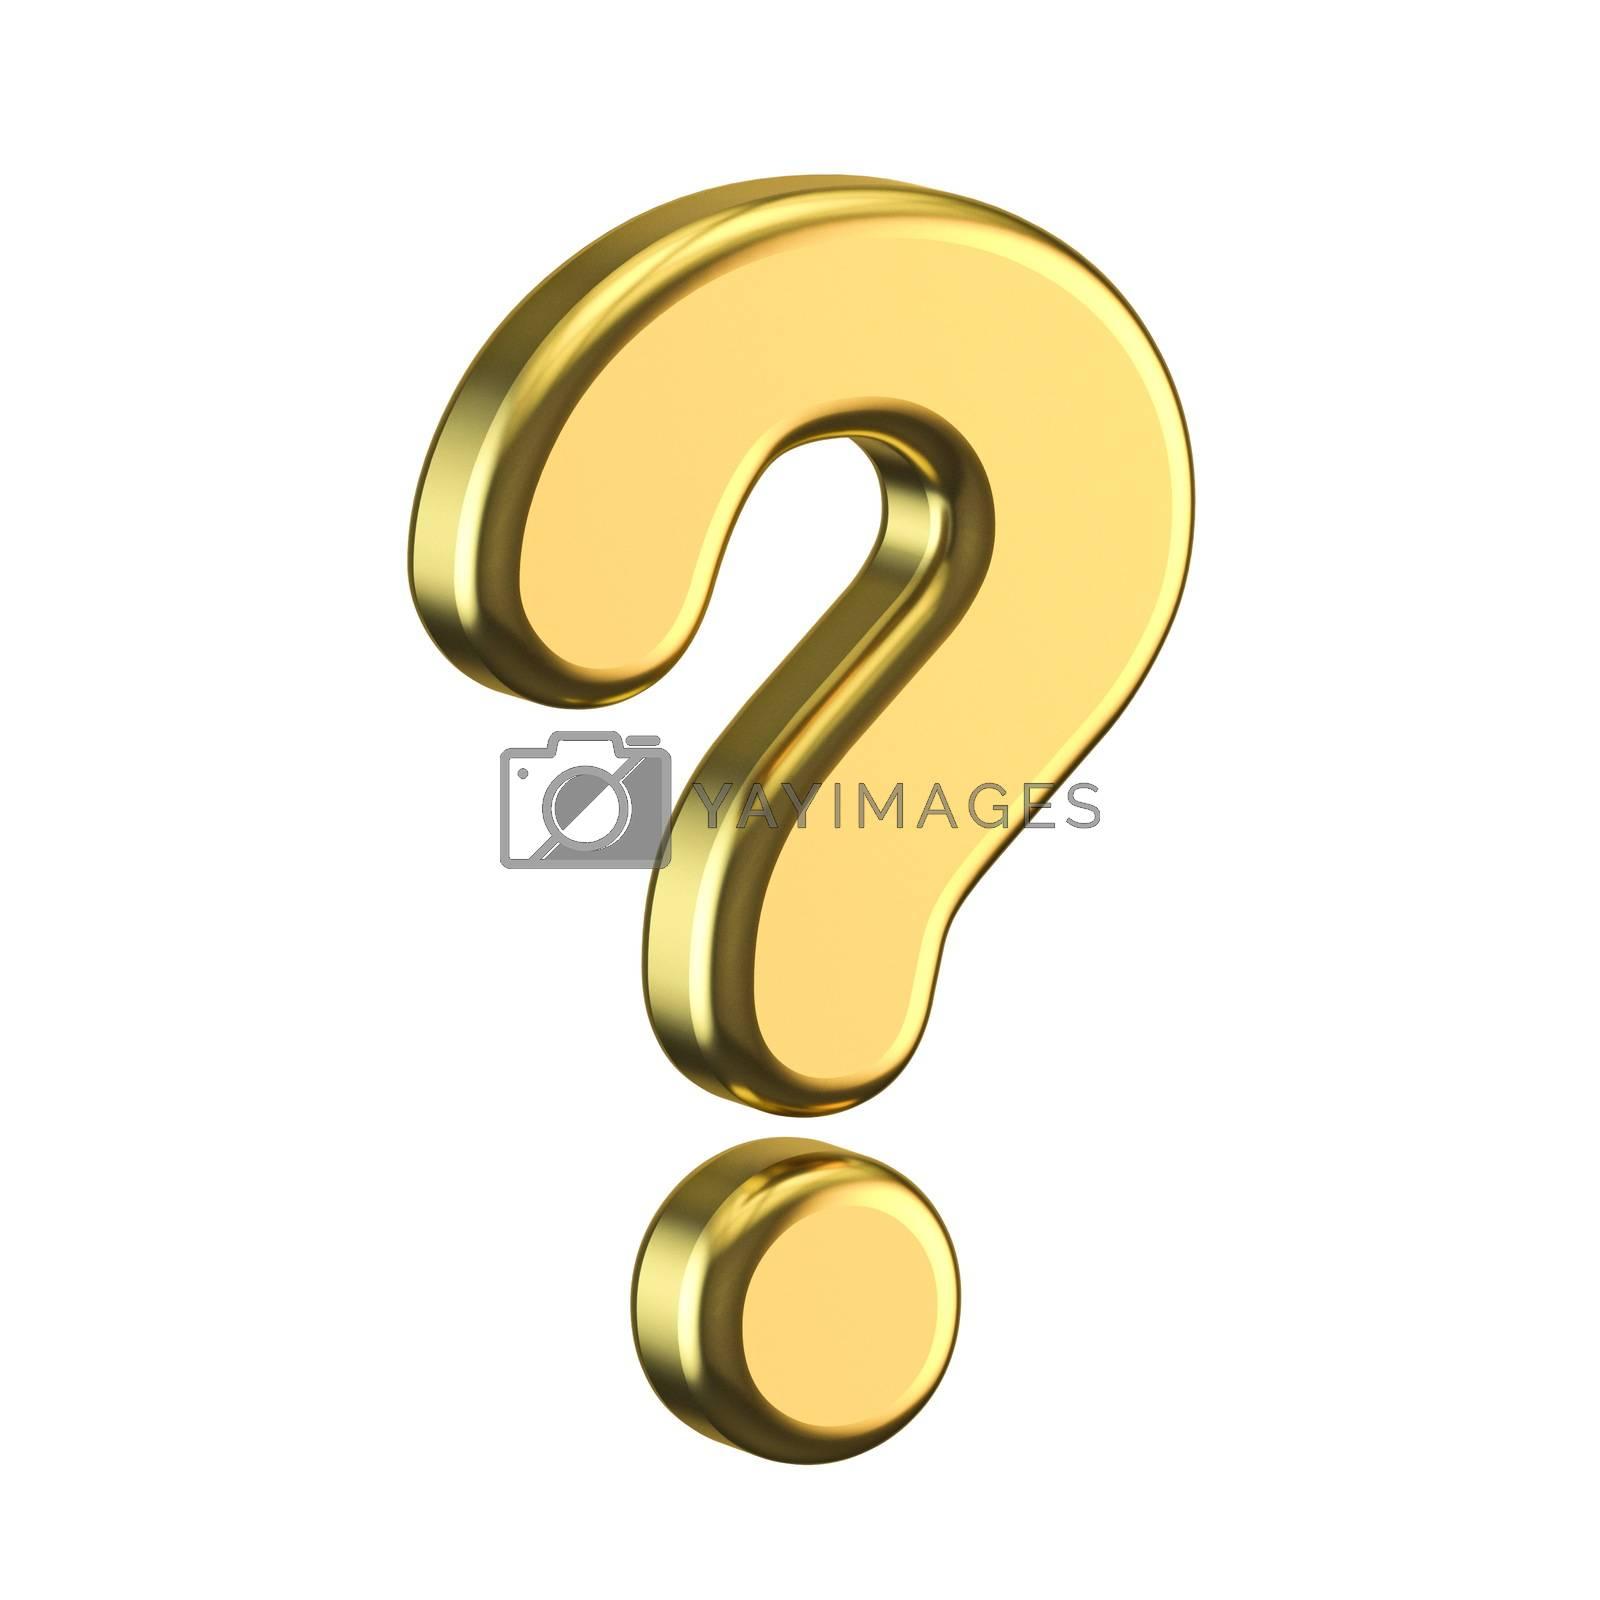 Golden question mark 3D render illustration isolated on white background